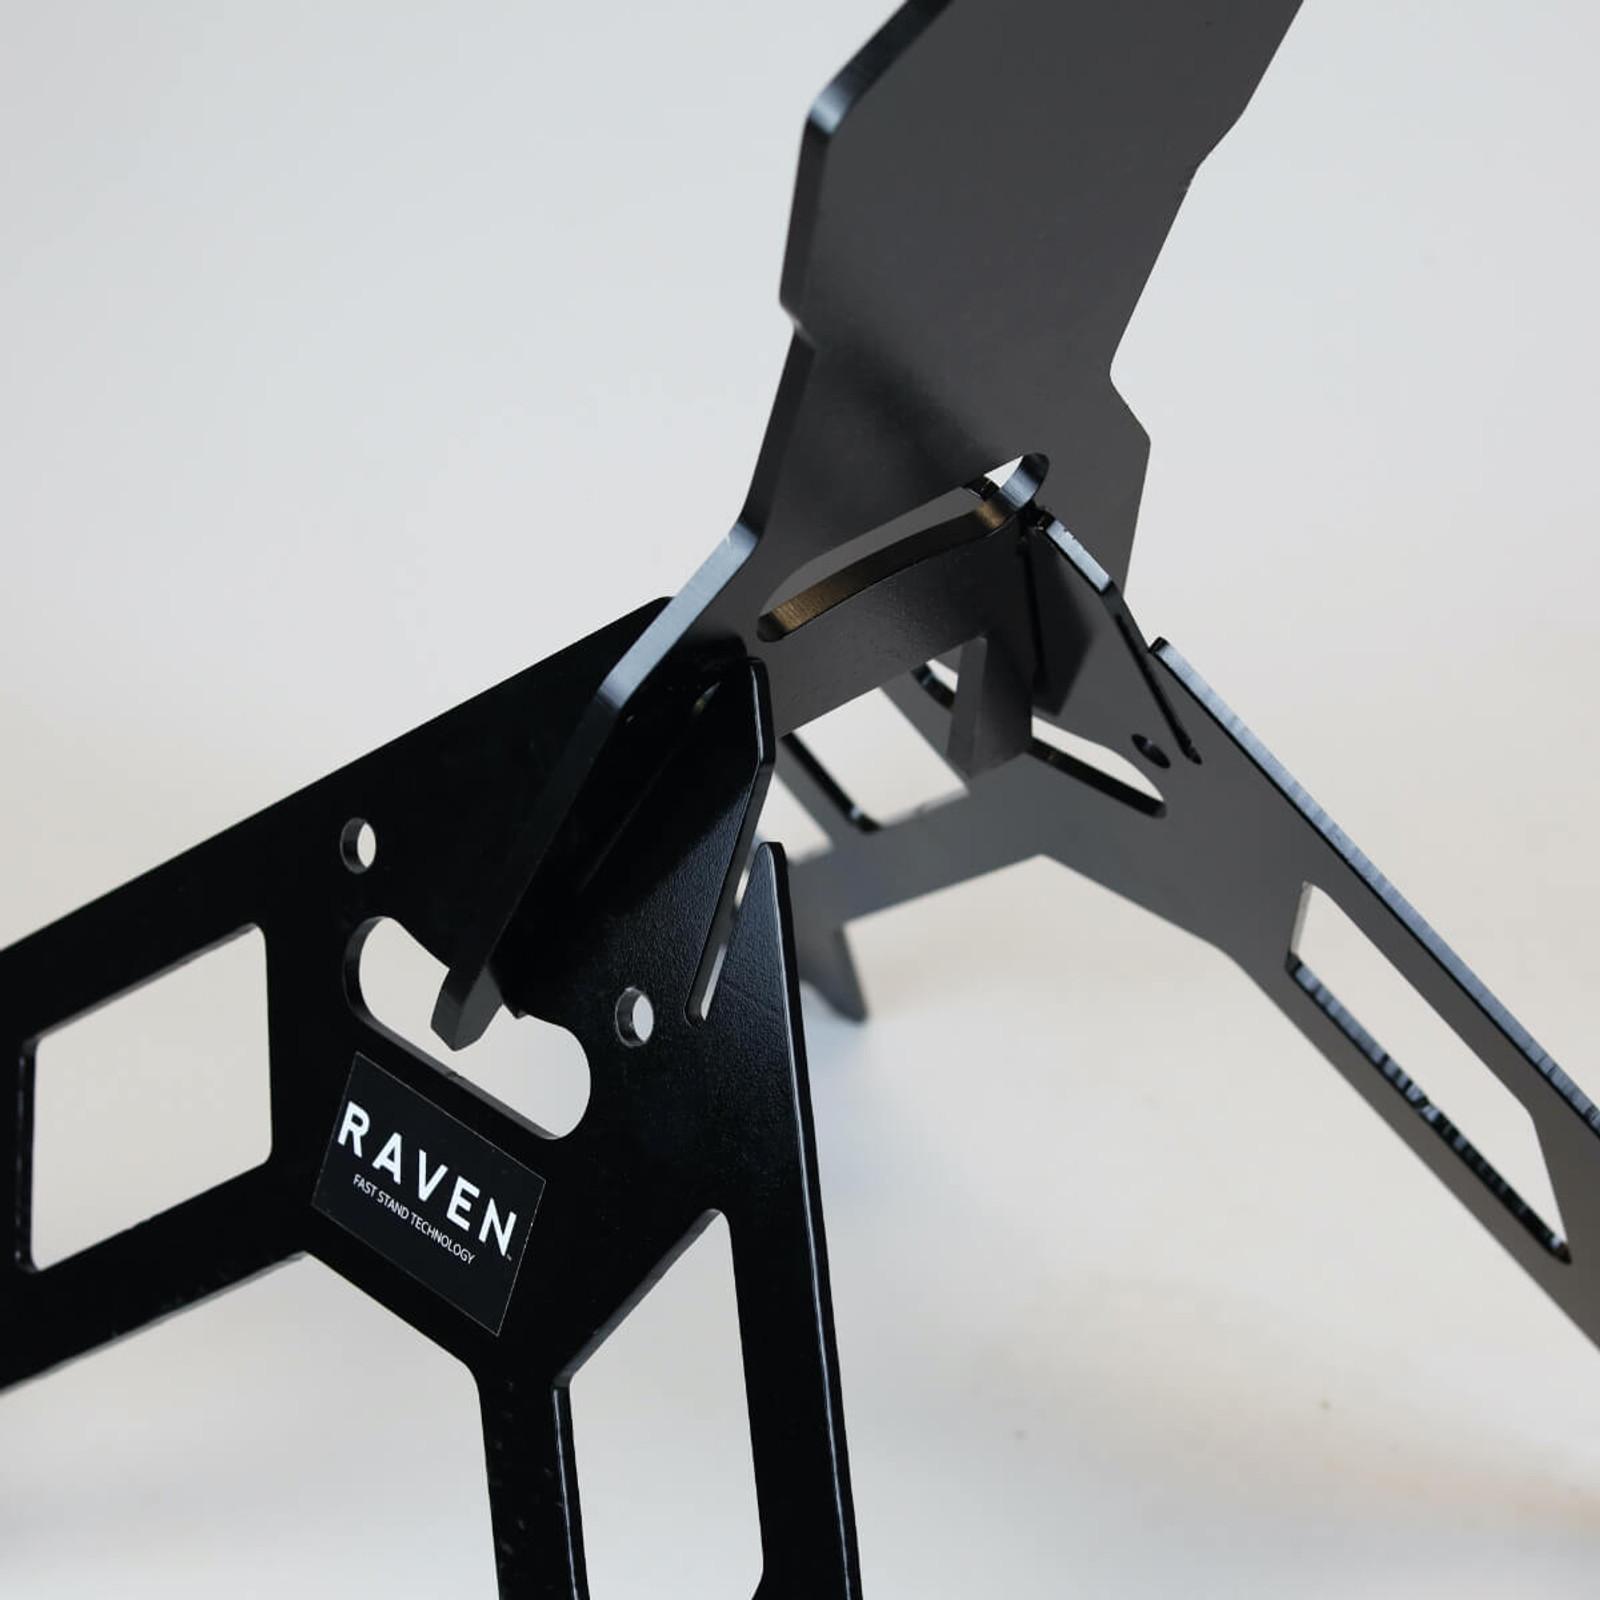 Mini RAVEN Steel Target System